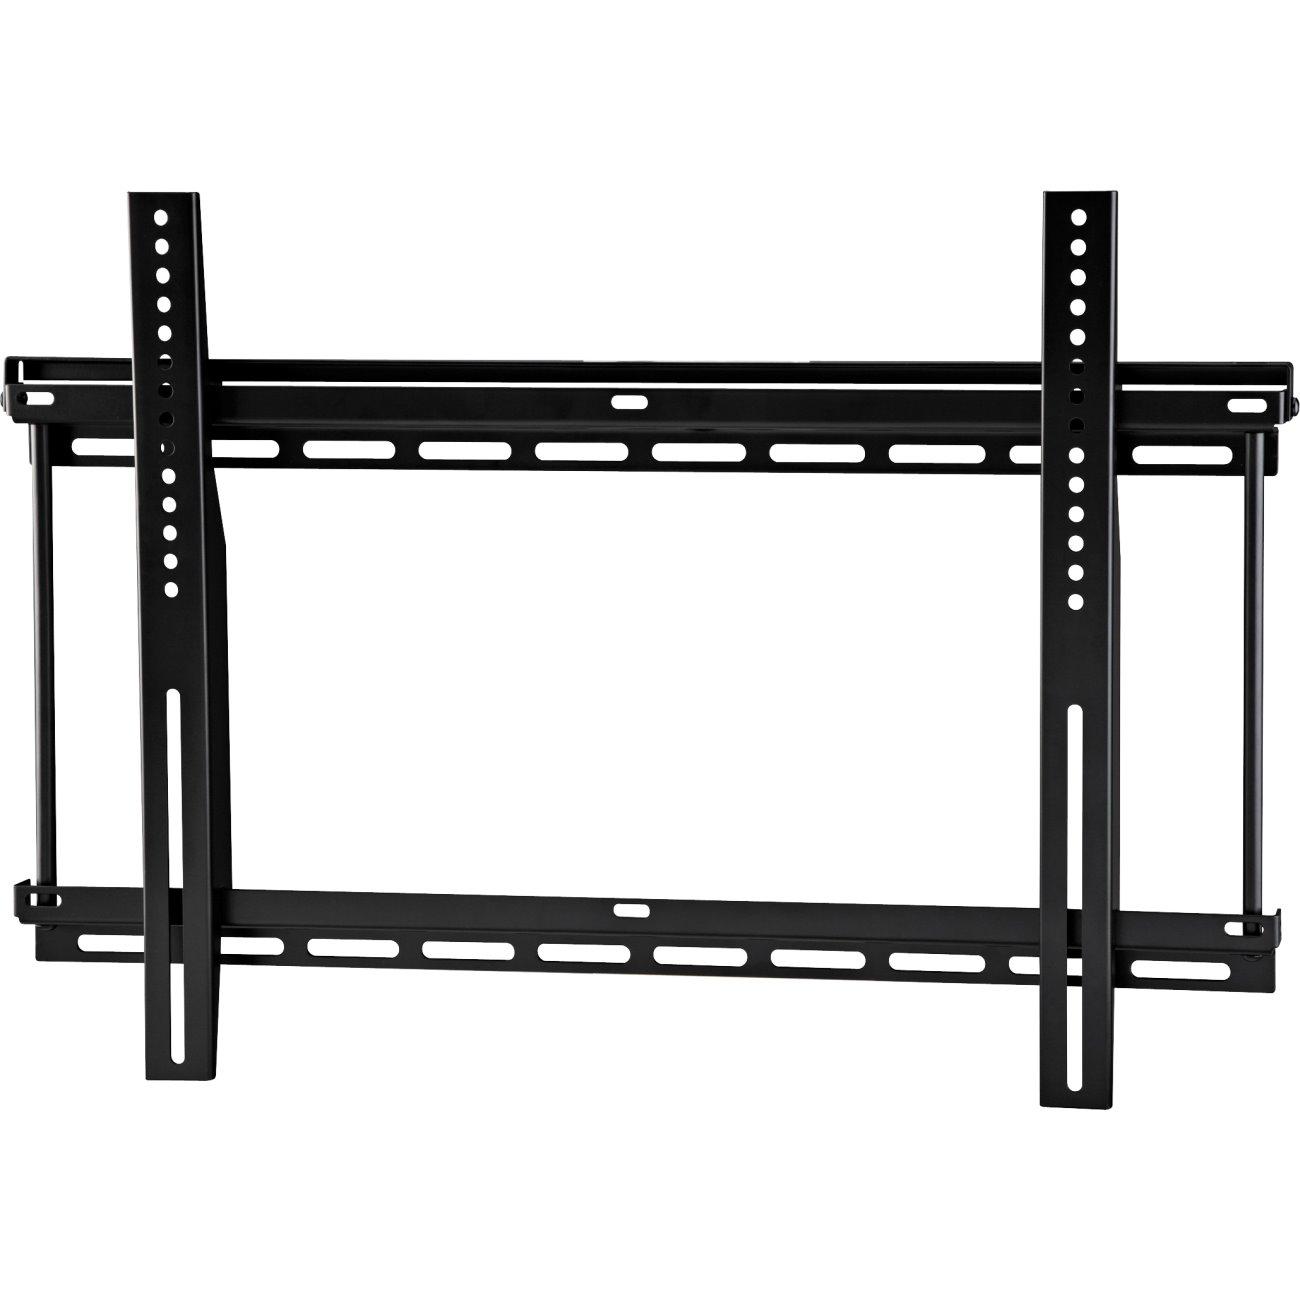 Ergotron Neo-Flex 60-614 Wall Mount for Flat Panel Display - Black